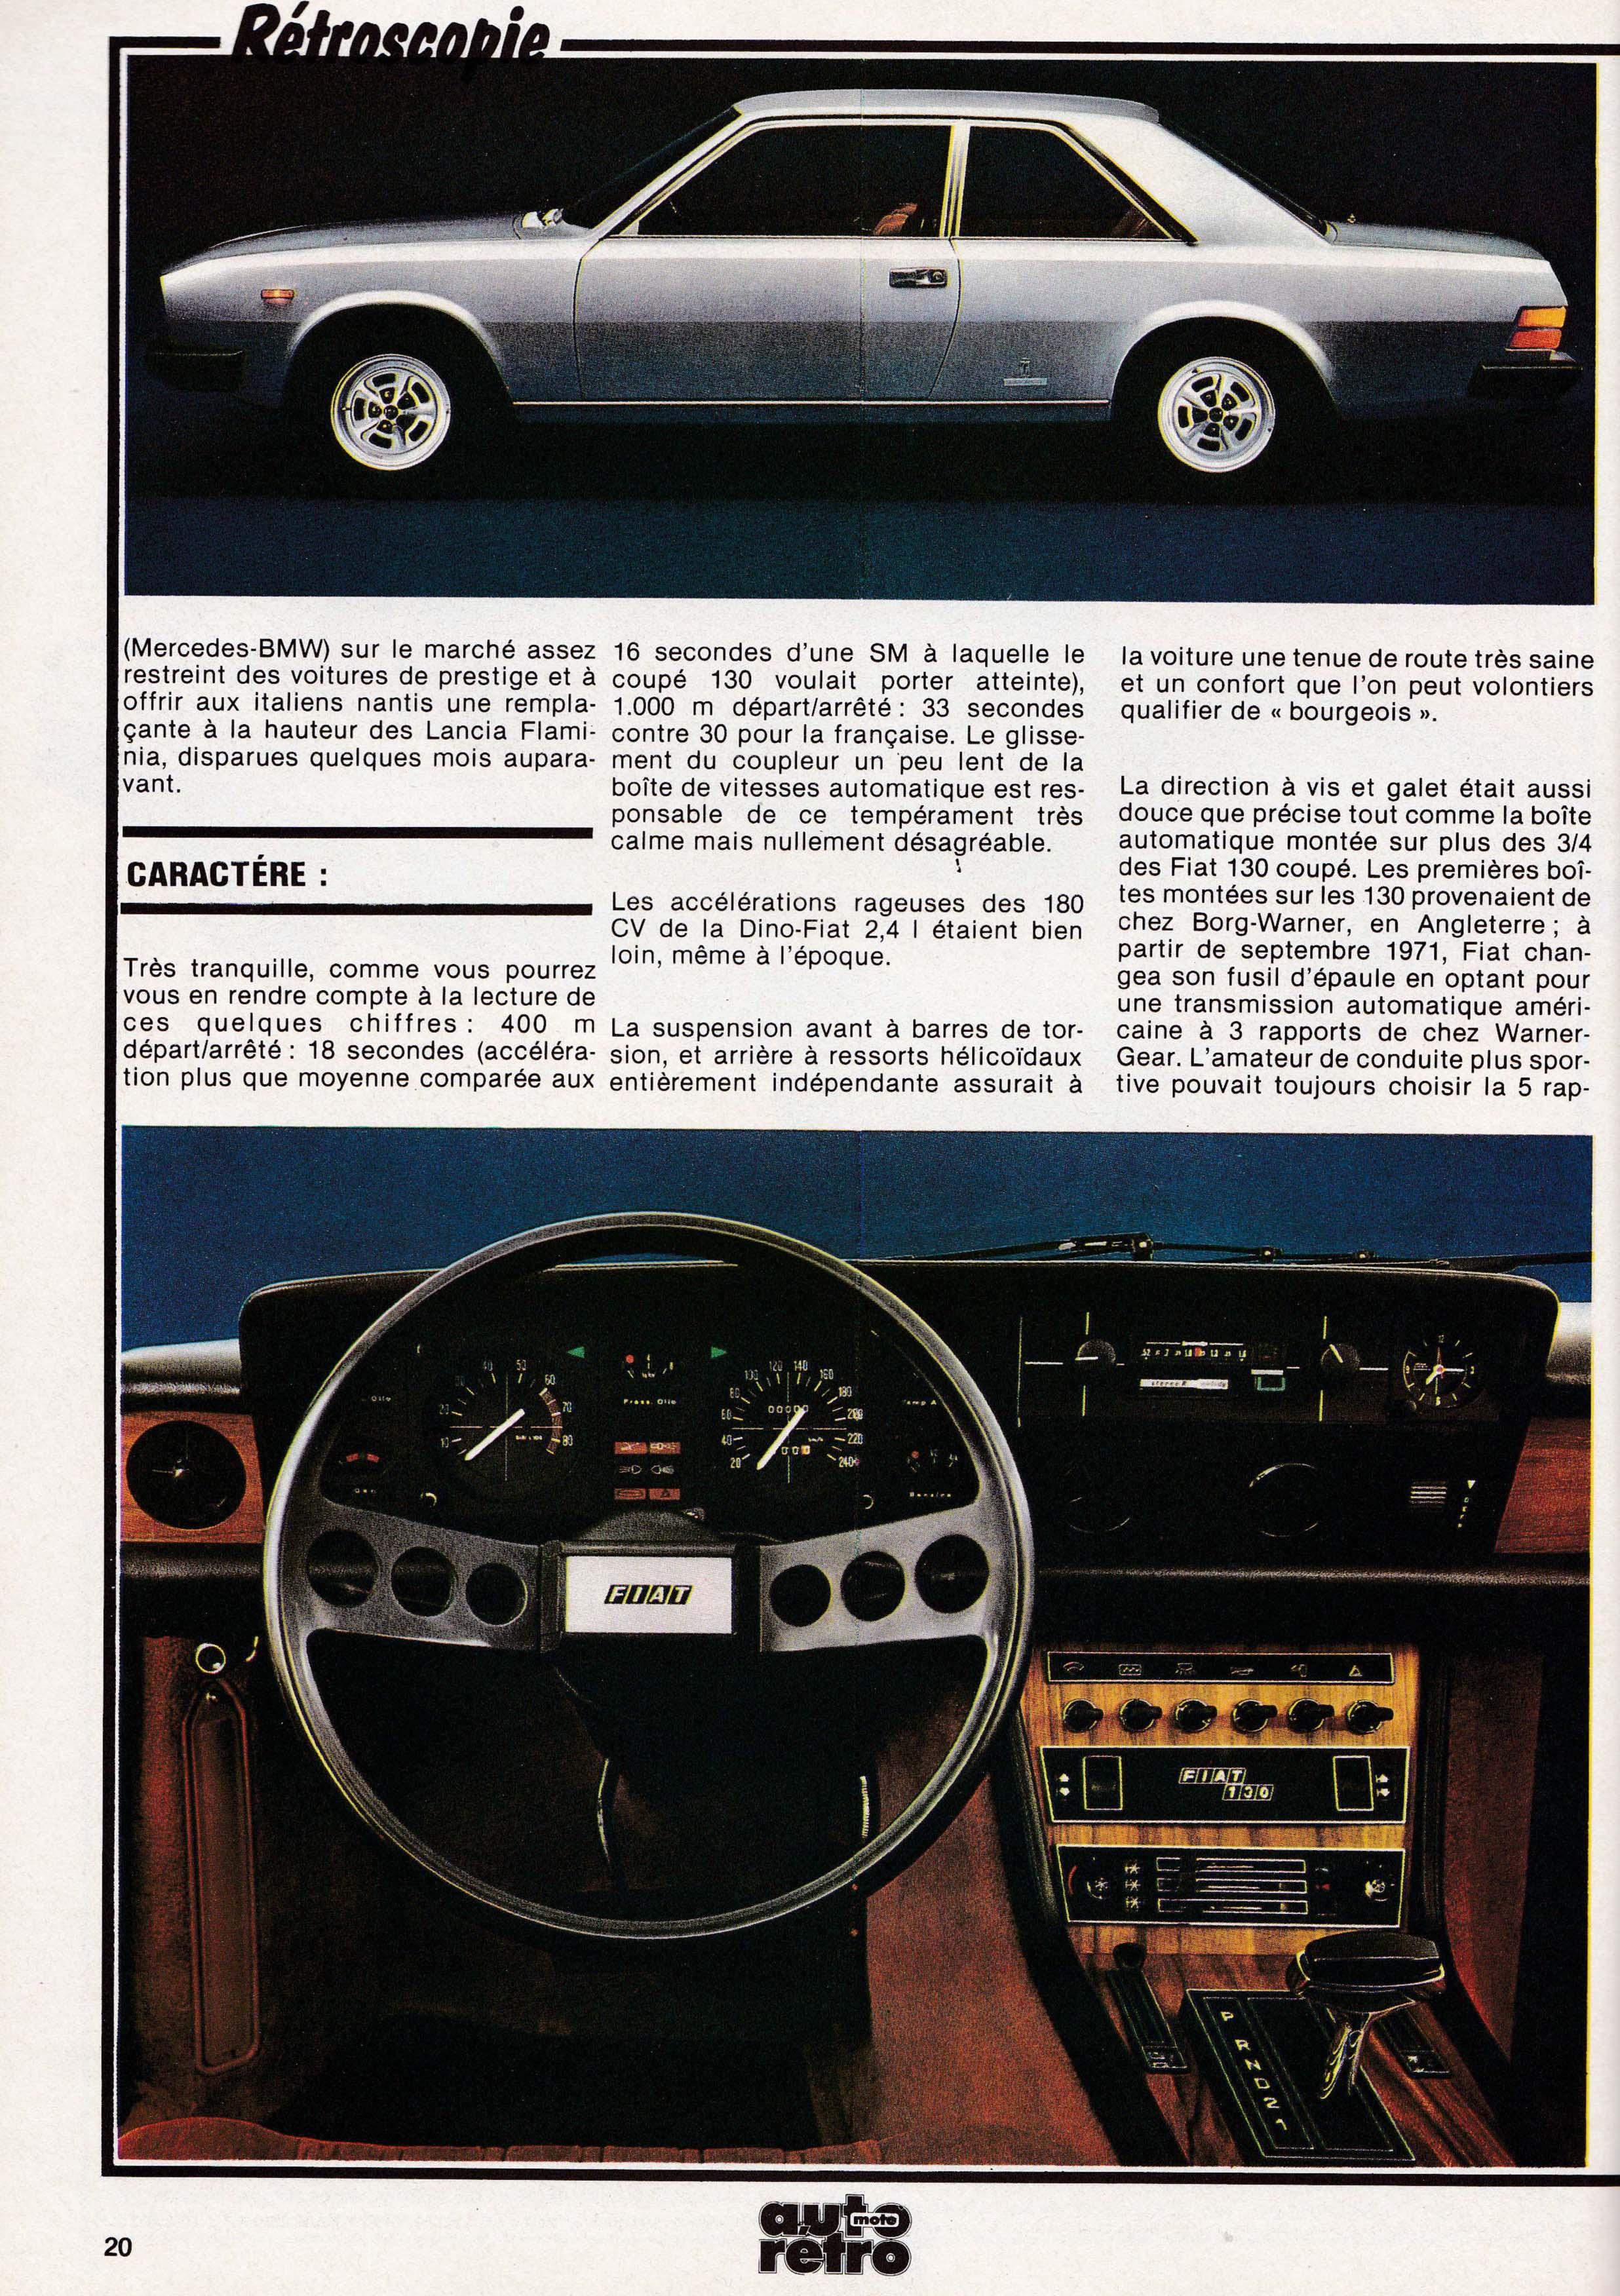 AutomotoRetro 1983